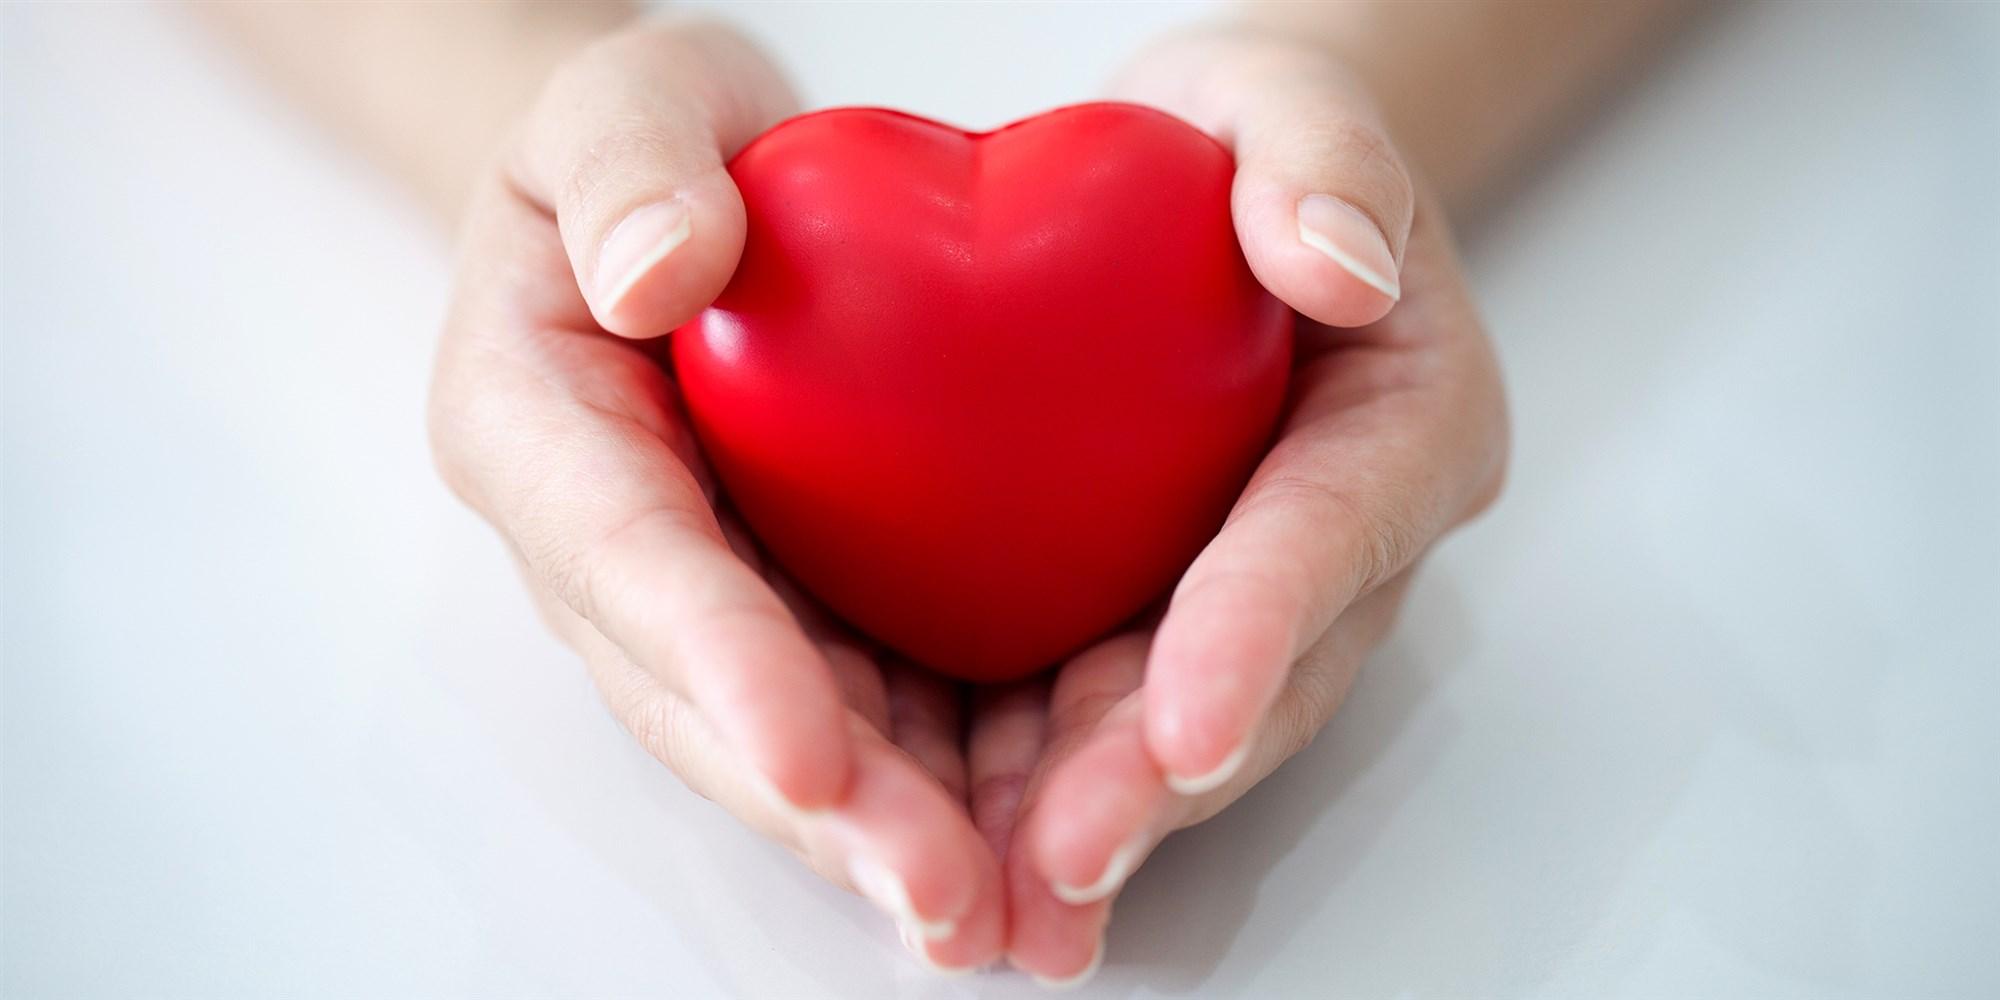 heart-health-today-main-190205_2f9b9d7d2c9532705688b9e54fc88767.fit-2000w_1549996515331.jpg